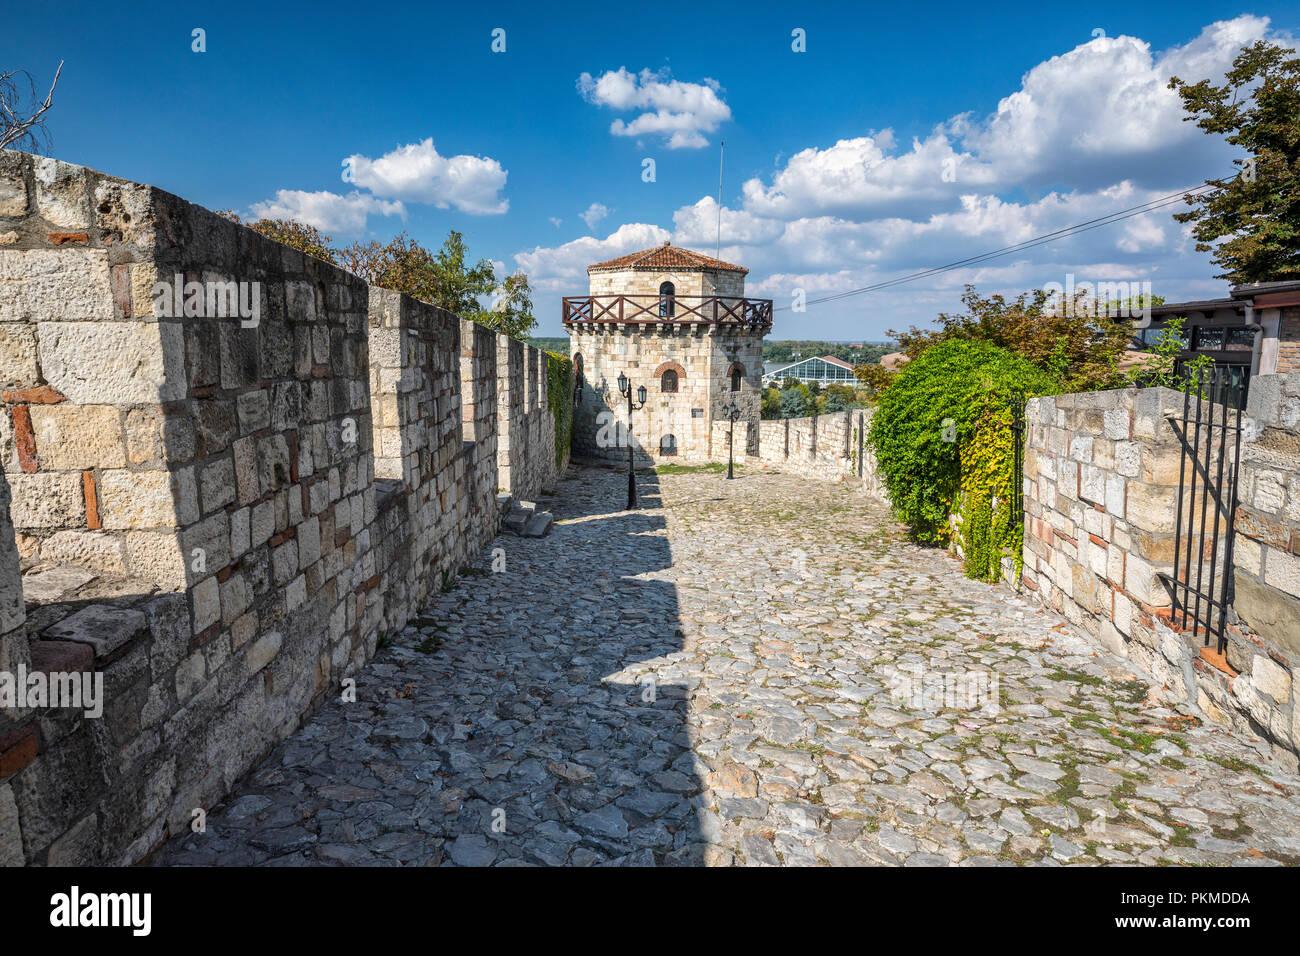 Kalemegdan fortress in Belgrade - Stock Image